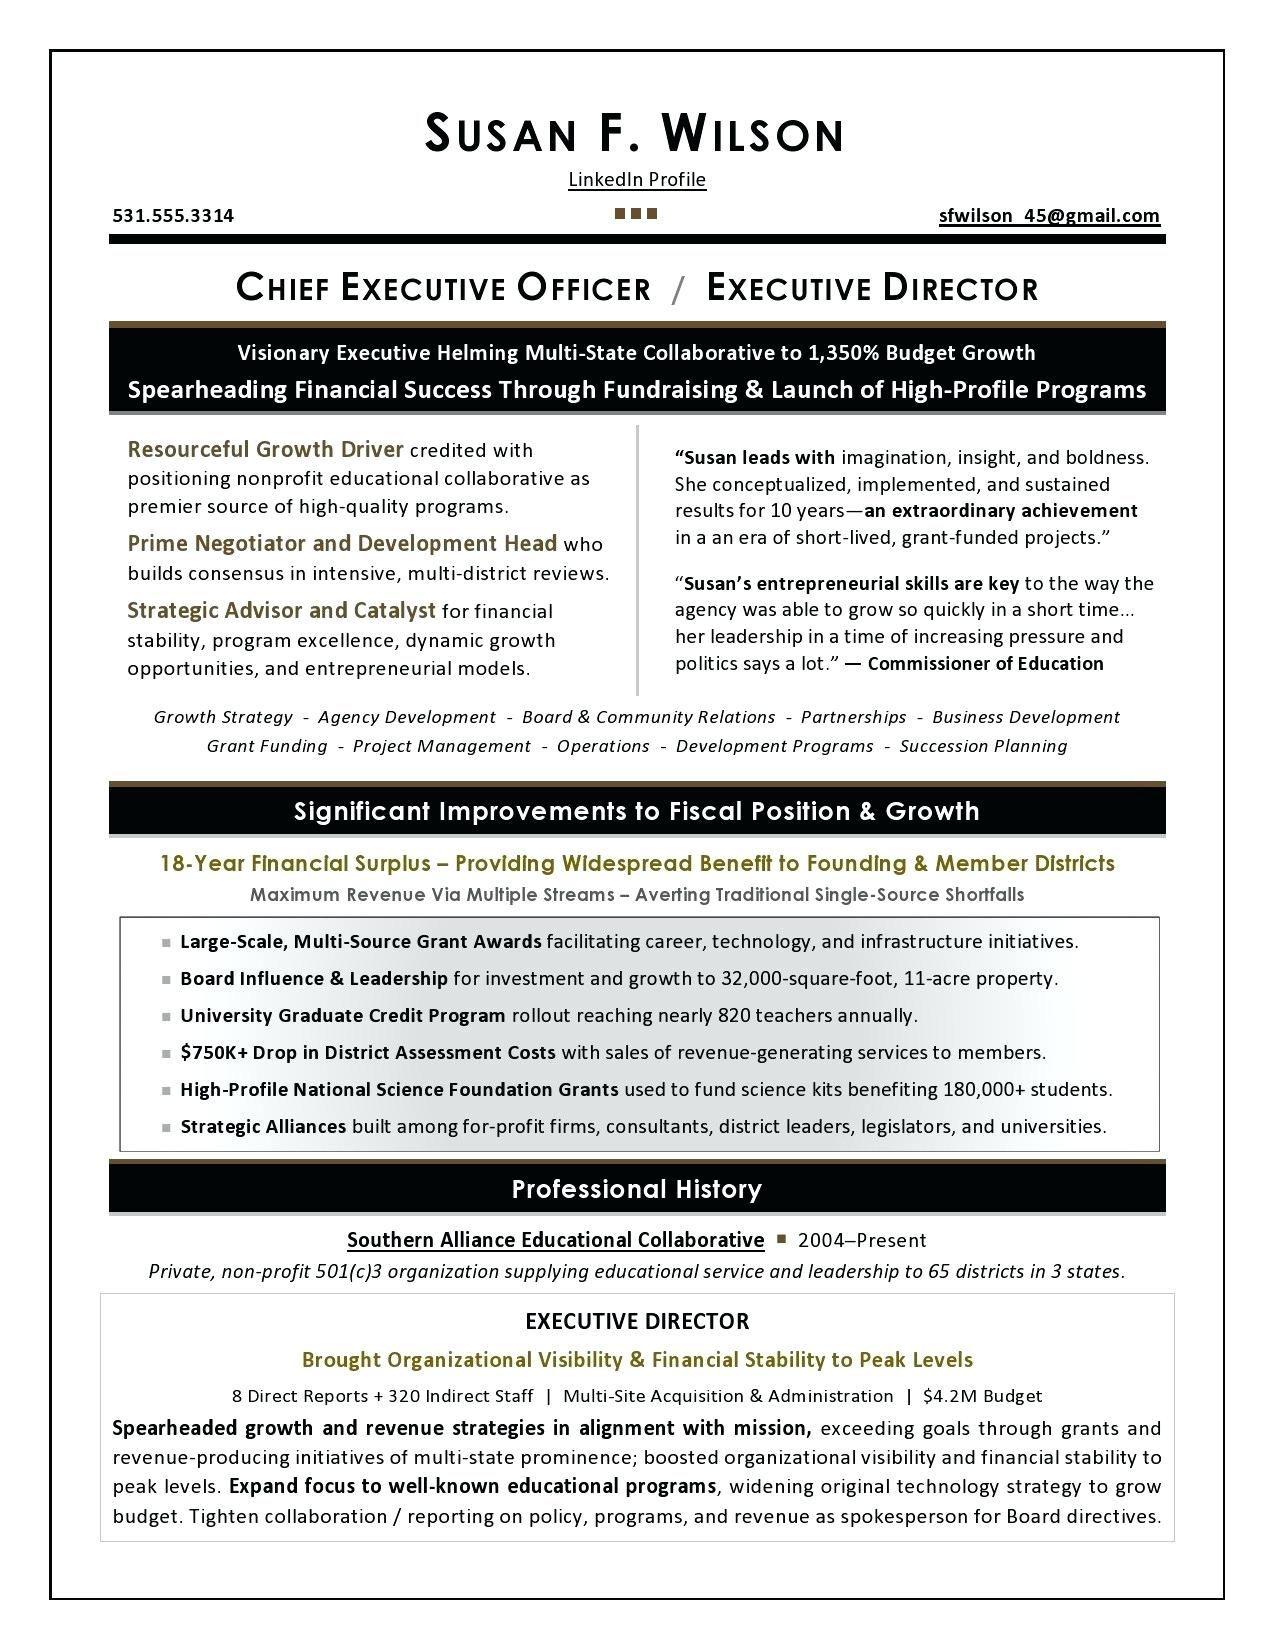 Chief operating officer resume fresh resume resume profile